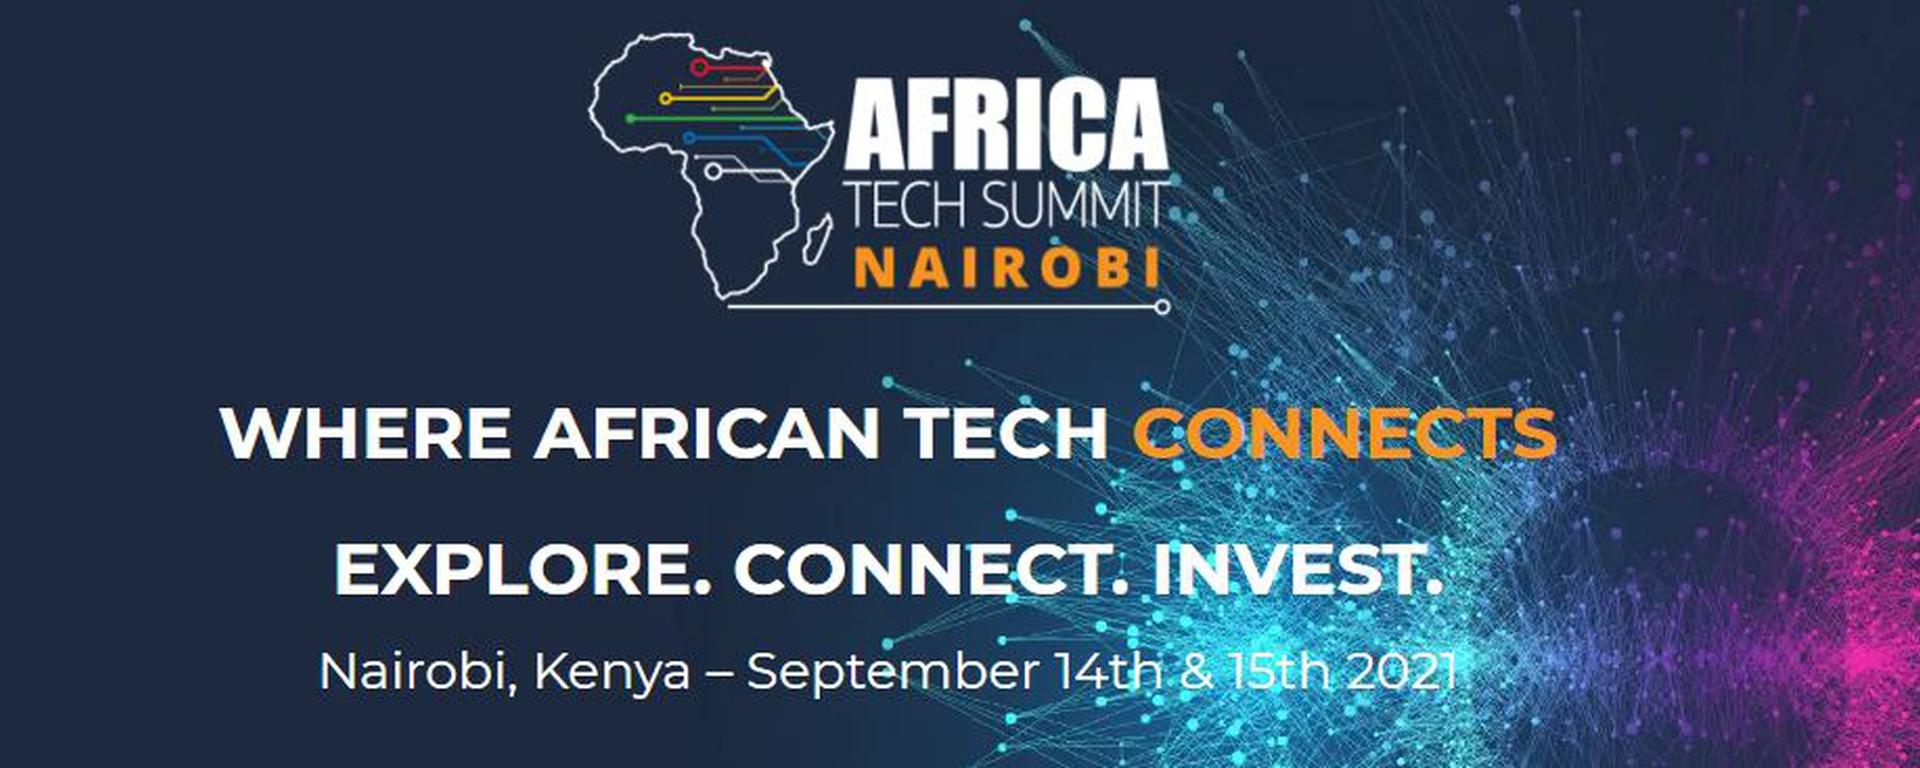 Africa Tech Summit - Africa Tech Summit Nairobi Movemeback African event cover image